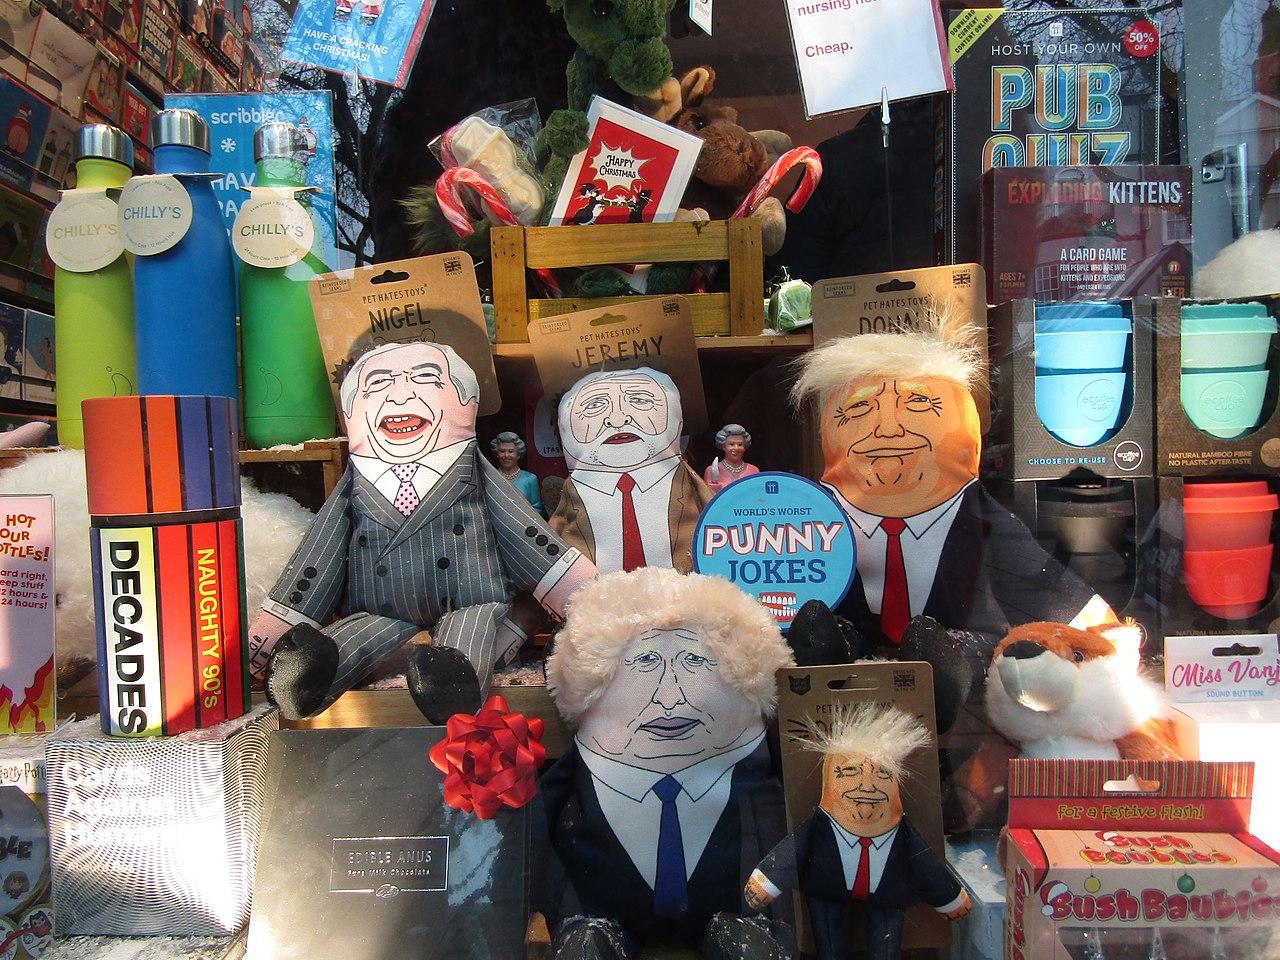 1280px 2019 12 18 Politician pet hate dolls Scribbler Cards The Royal Arcade Norwich JPG